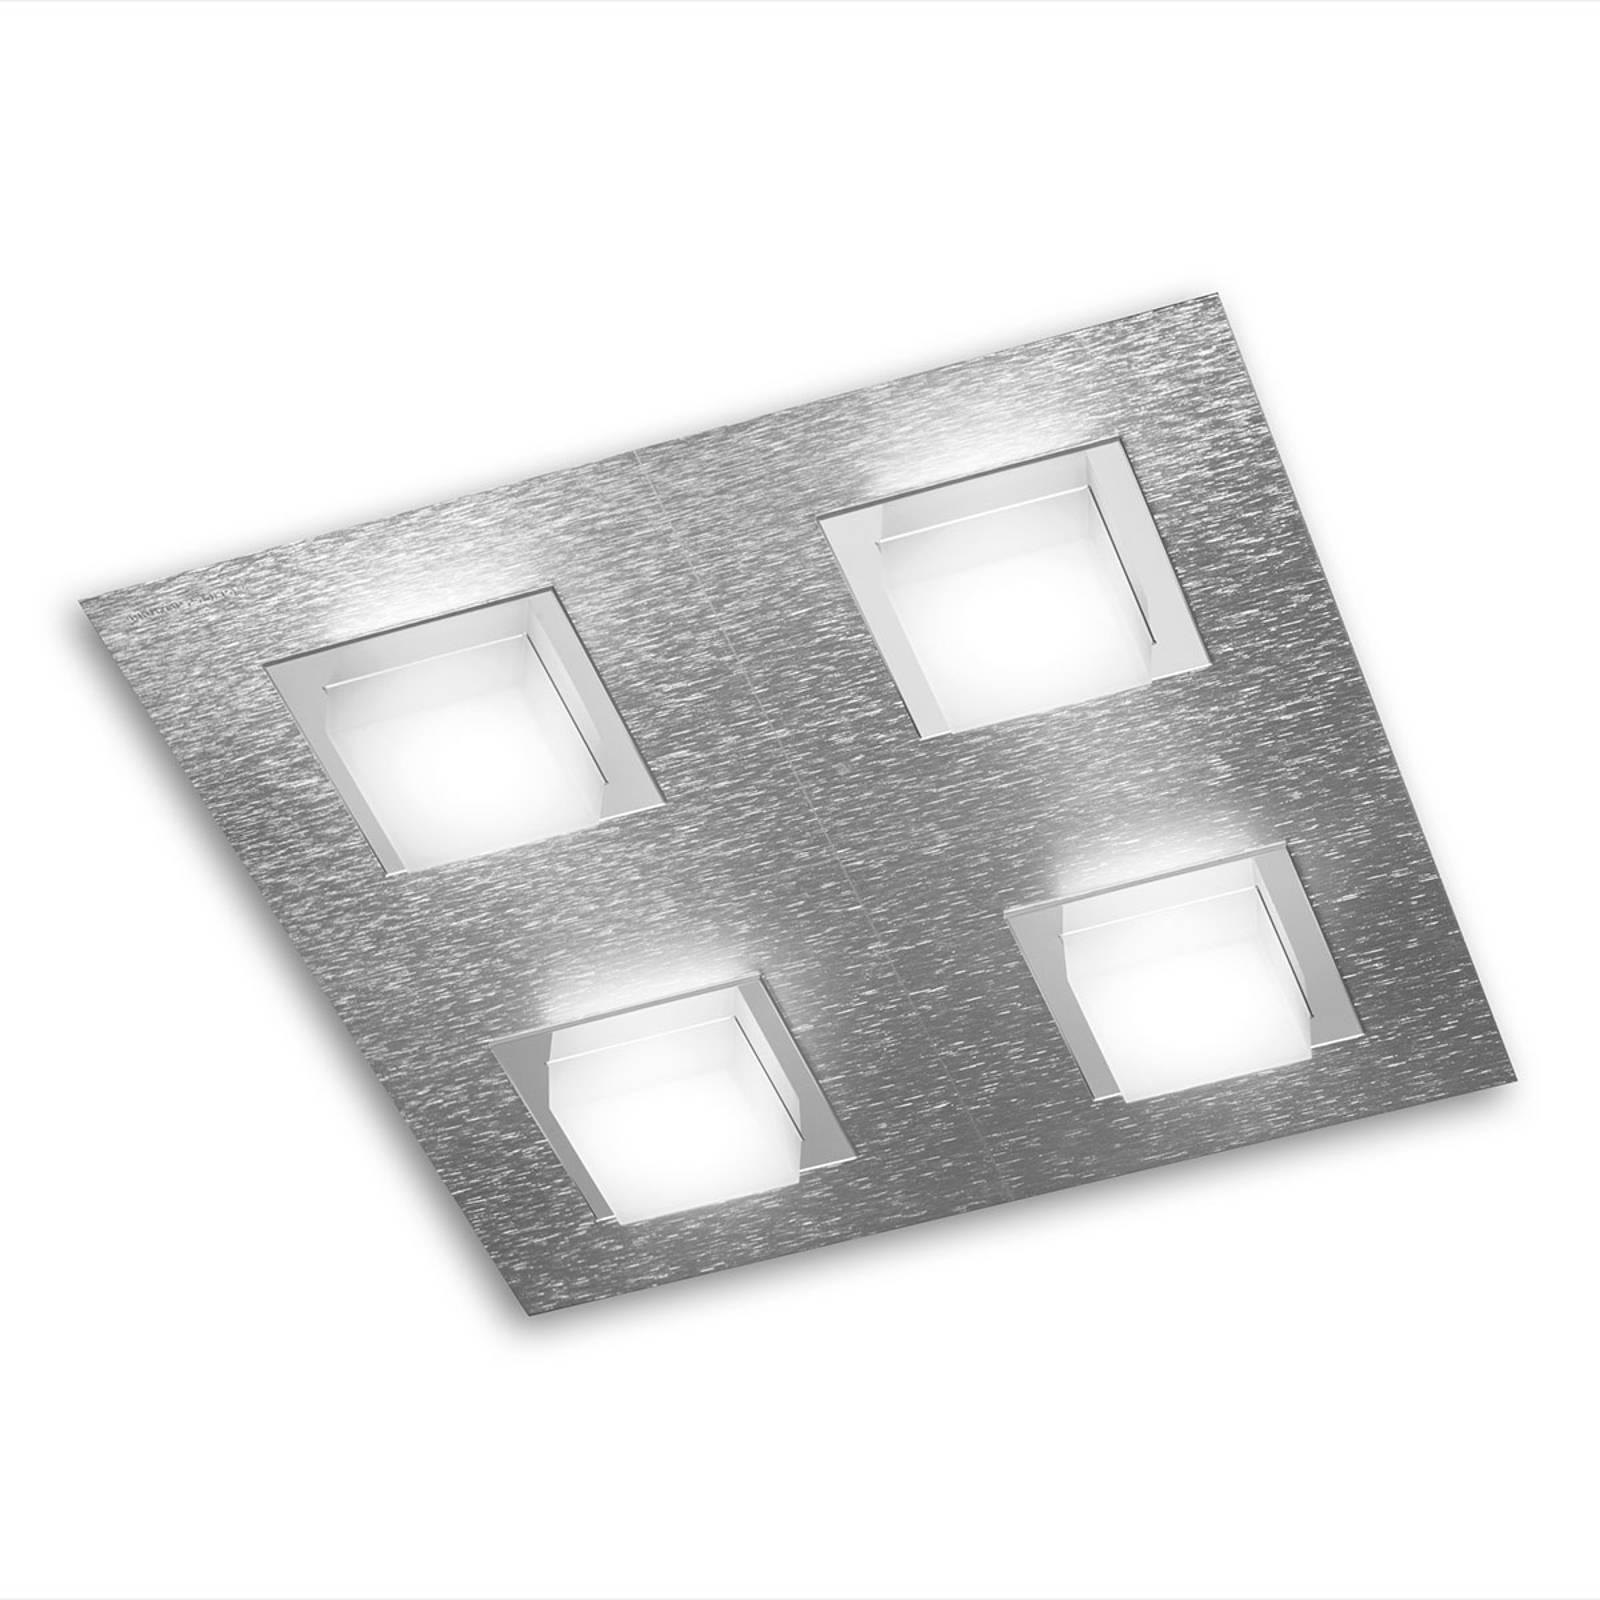 GROSSMANN Basic LED-kattovalaisin, 4-lampp., alu